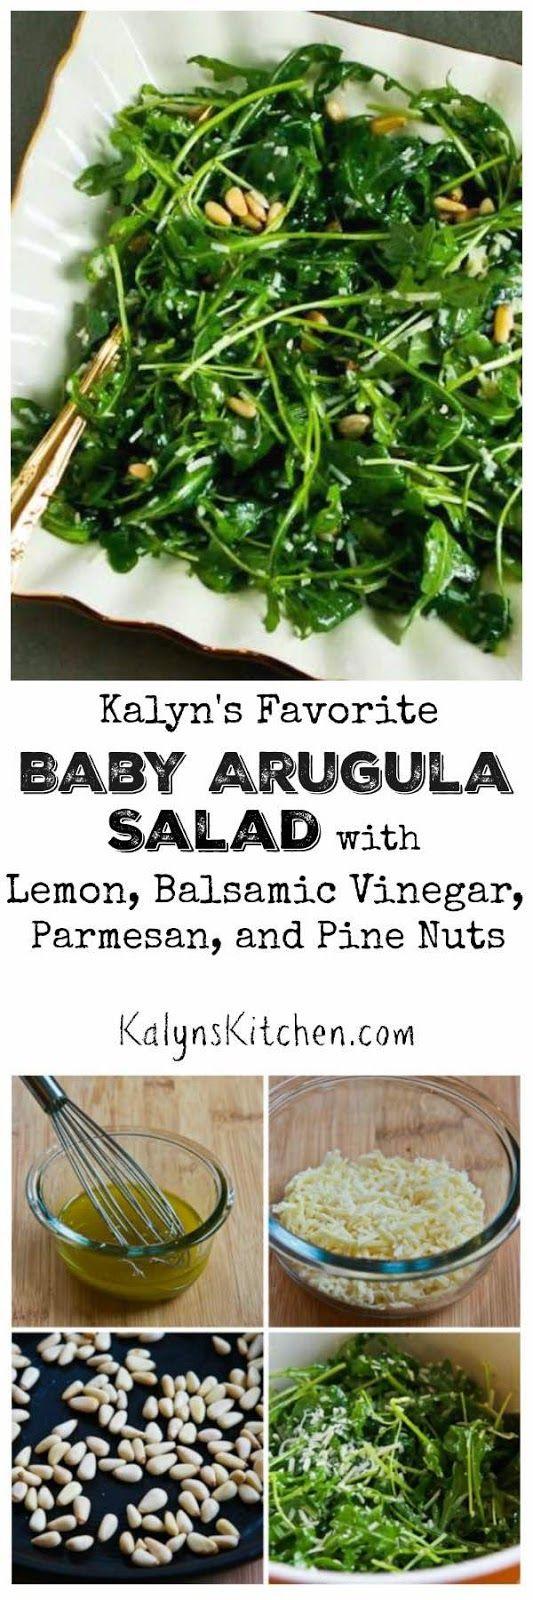 Baby Arugula Salad with Lemon, Balsamic Vinegar, Parmesan, and Pine Nuts [found on KalynsKitchen.com]